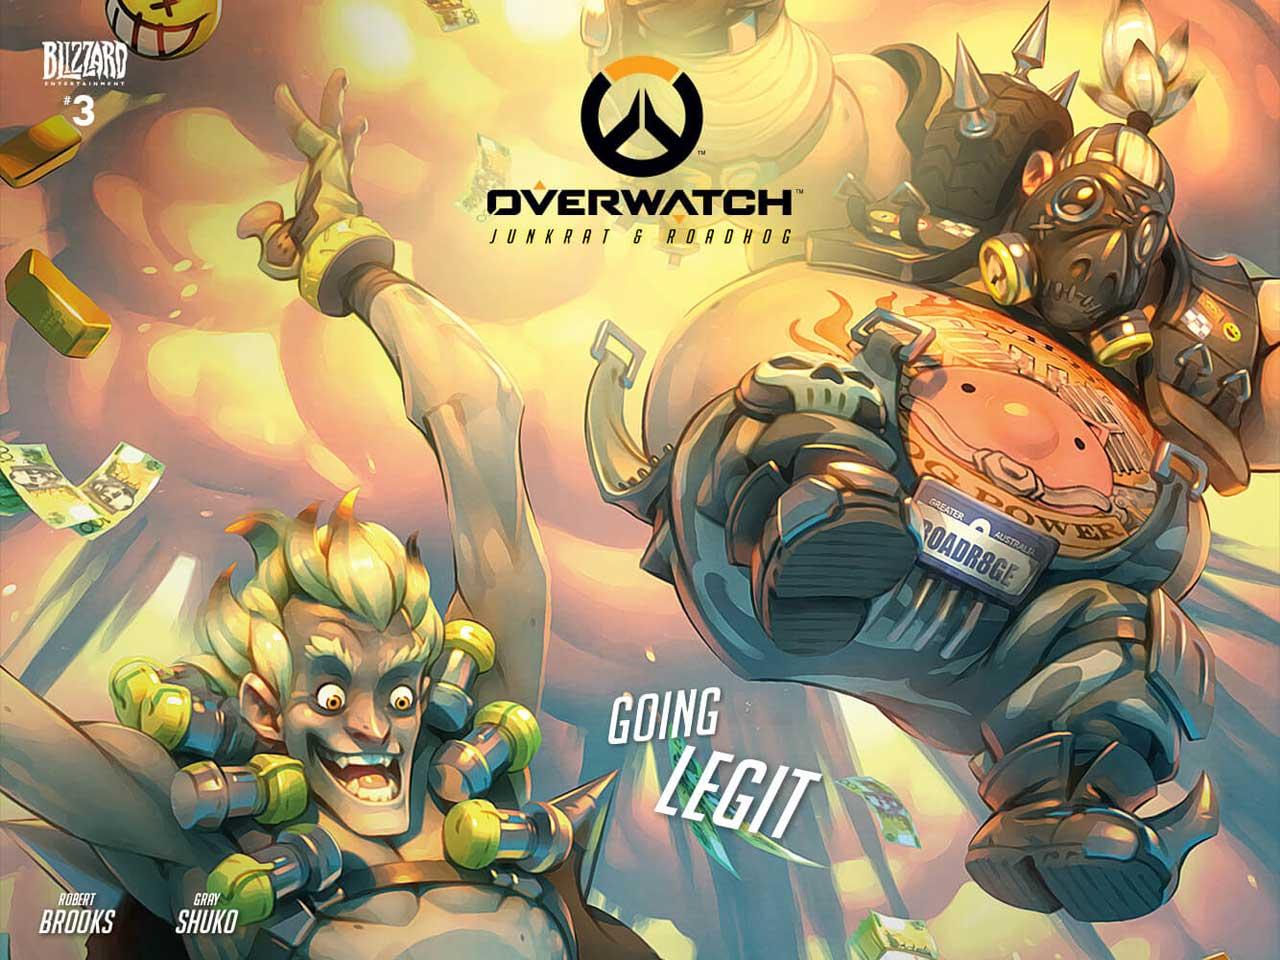 overwatch_characters_comic_3_junkrat_roadhog_going_legit